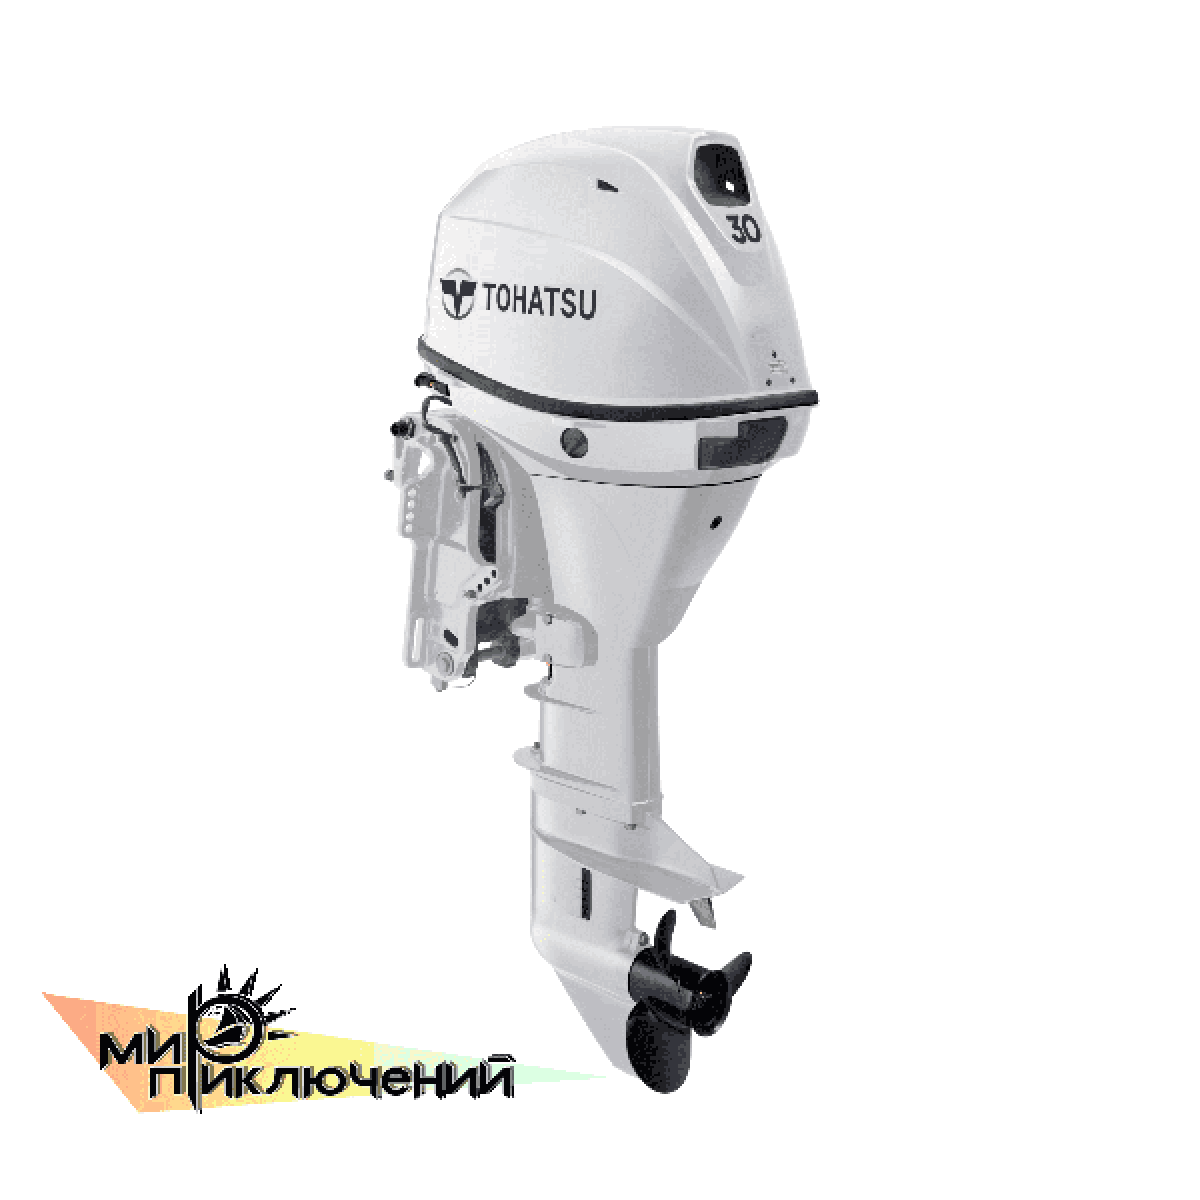 Tohatsu MFS 30 WHITE EPTL, 4 х тактный подвесной лодочный мотор Тохатсу 30 л с  белый